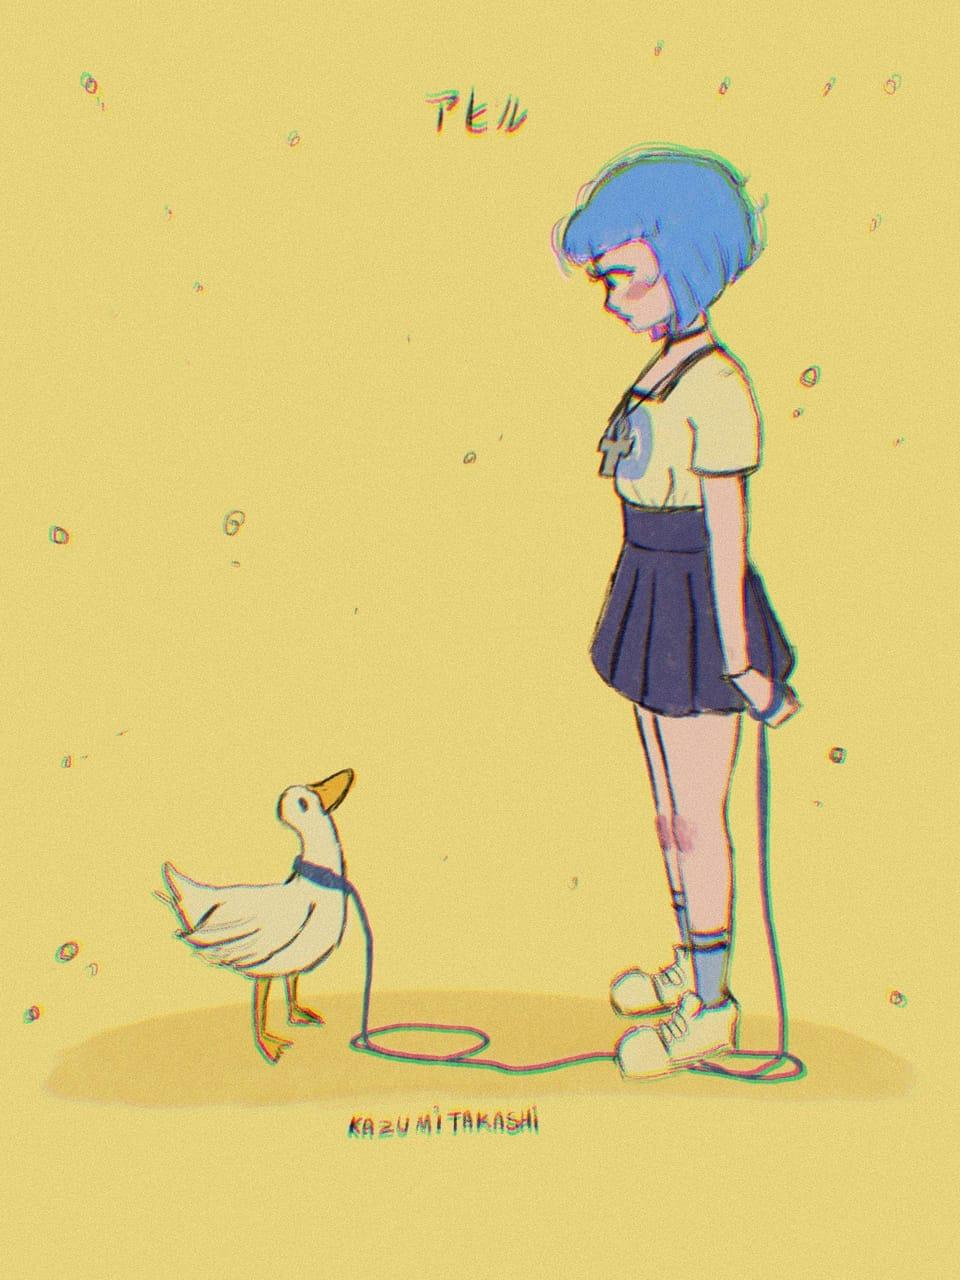 inner peace Illust of かずみたかし kazumitakashi original duckdood myself kazumi le